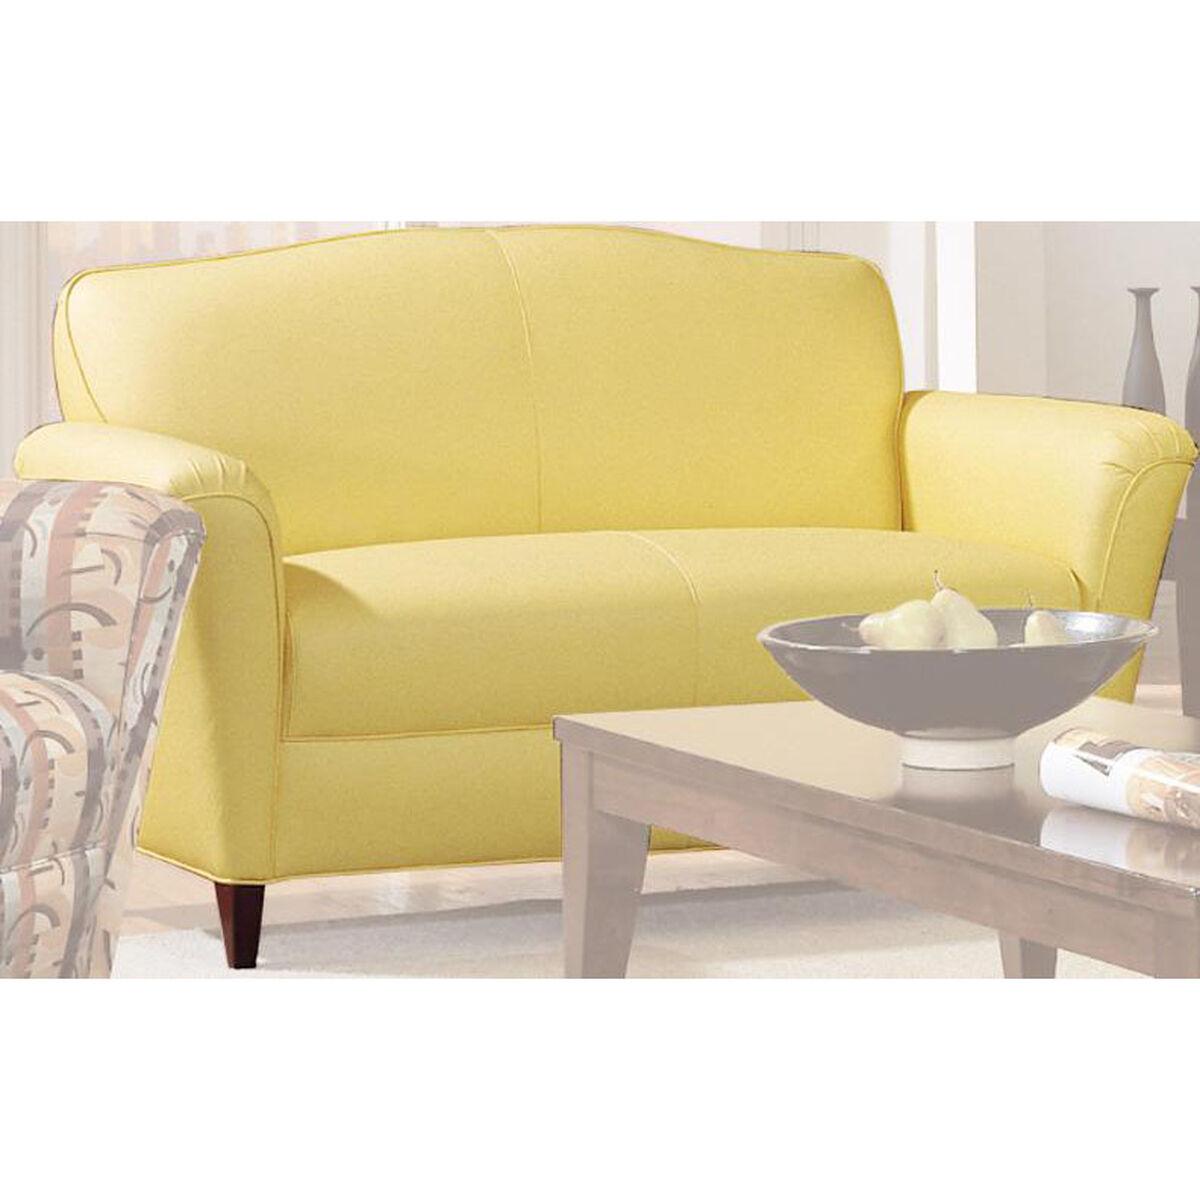 High point furniture industries 6402 hpf 6402 for Furniture 96 taren point